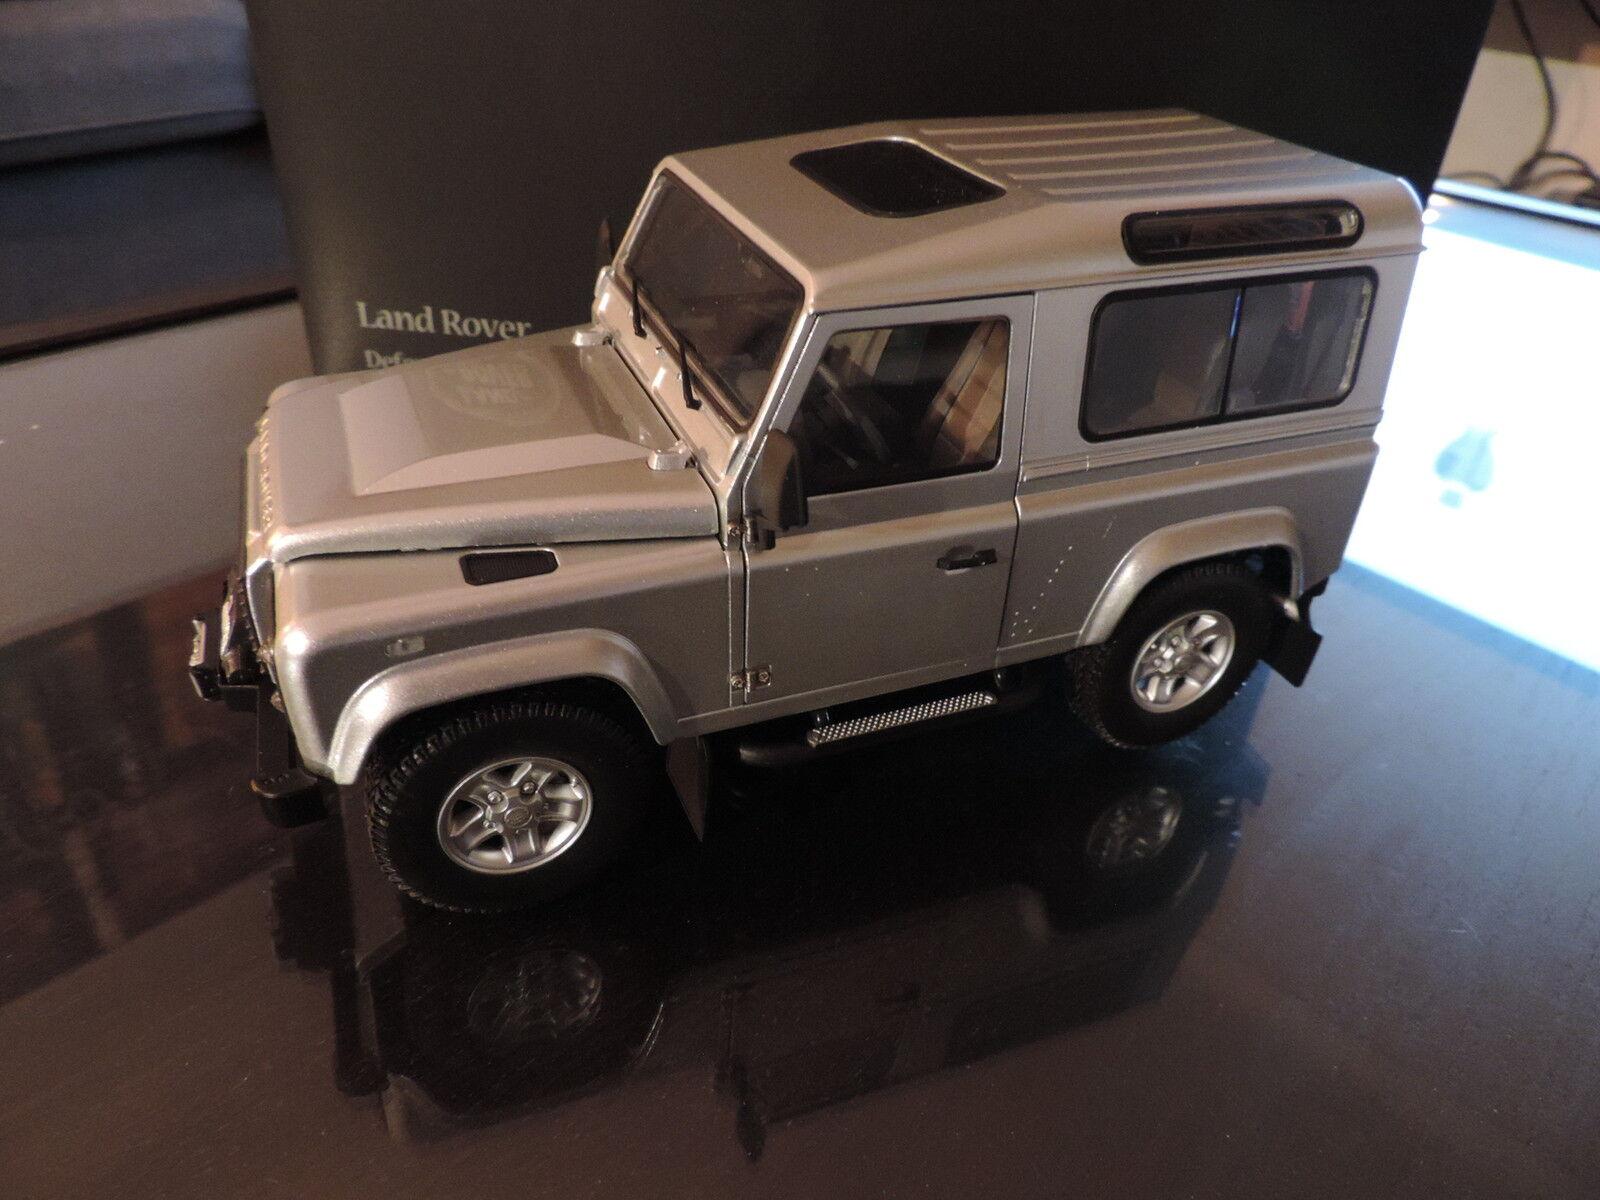 Land Rover Rover Rover Defender 90 au 1/18 Kyosho gris Indus Silver rare   Fiable Réputation  b493cf